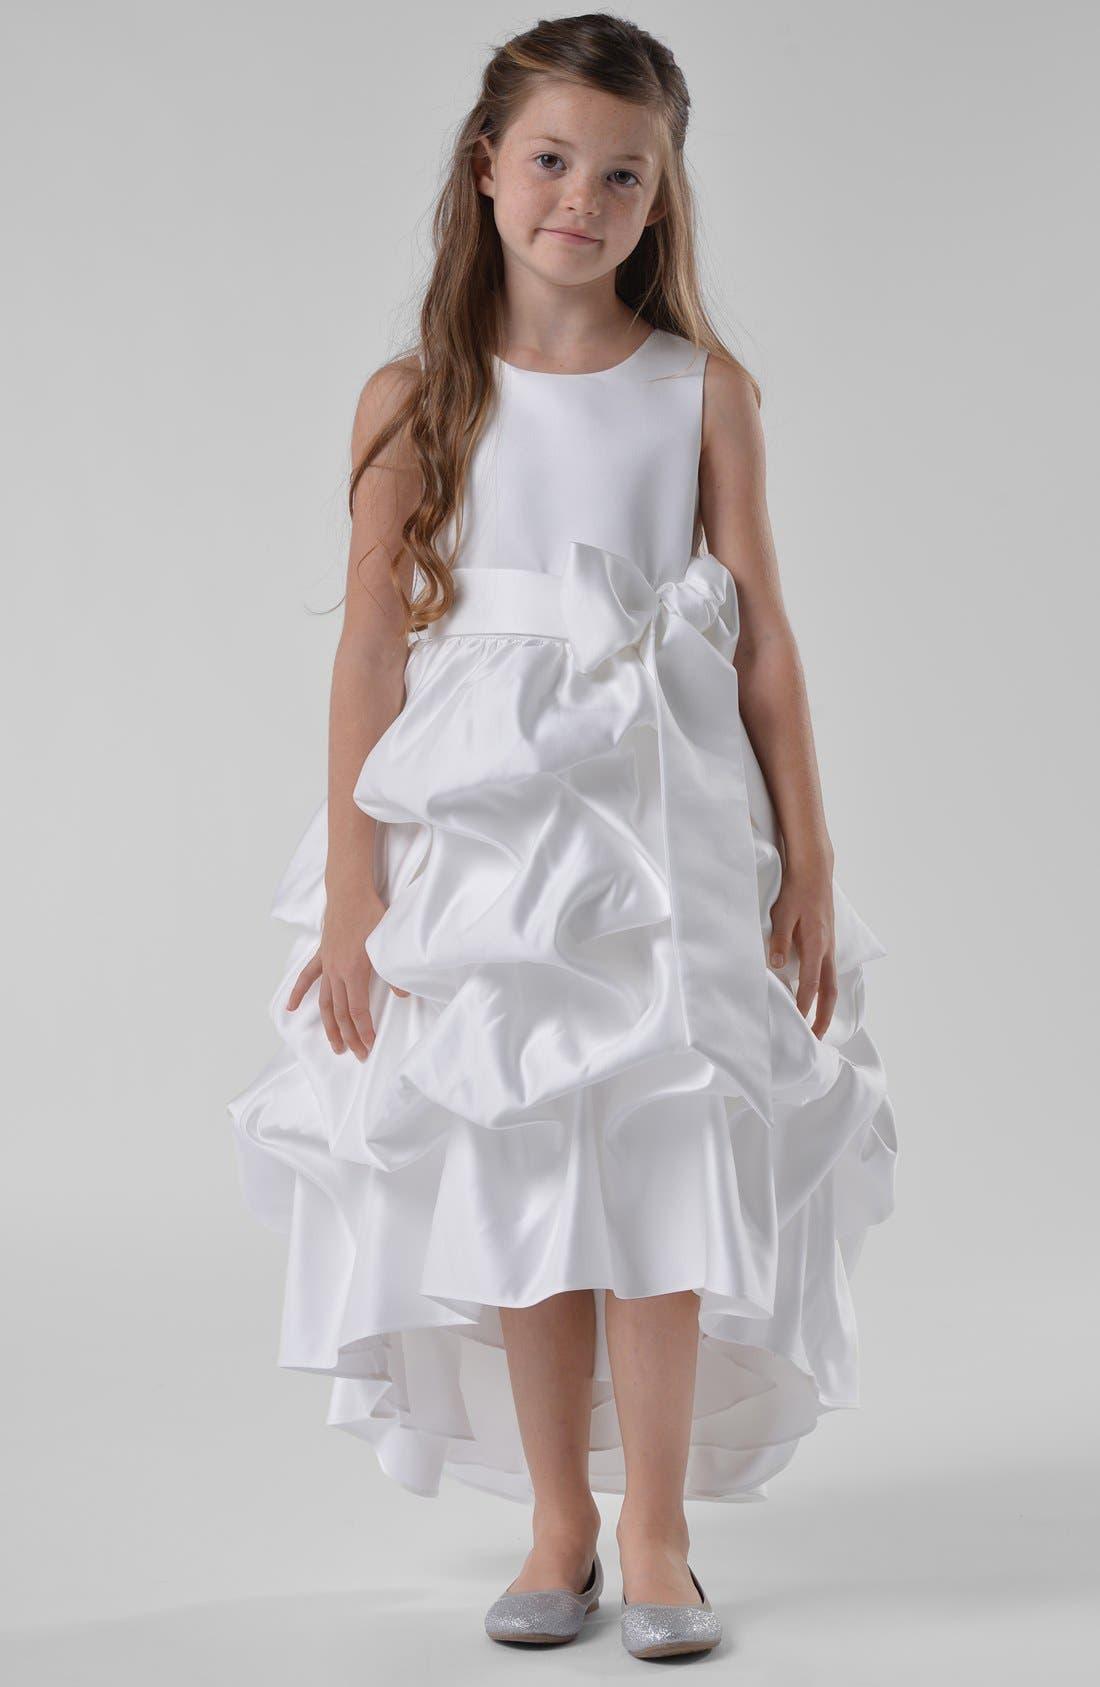 Alternate Image 1 Selected - Us Angels High/Low Satin Dress (Little Girls & Big Girls)